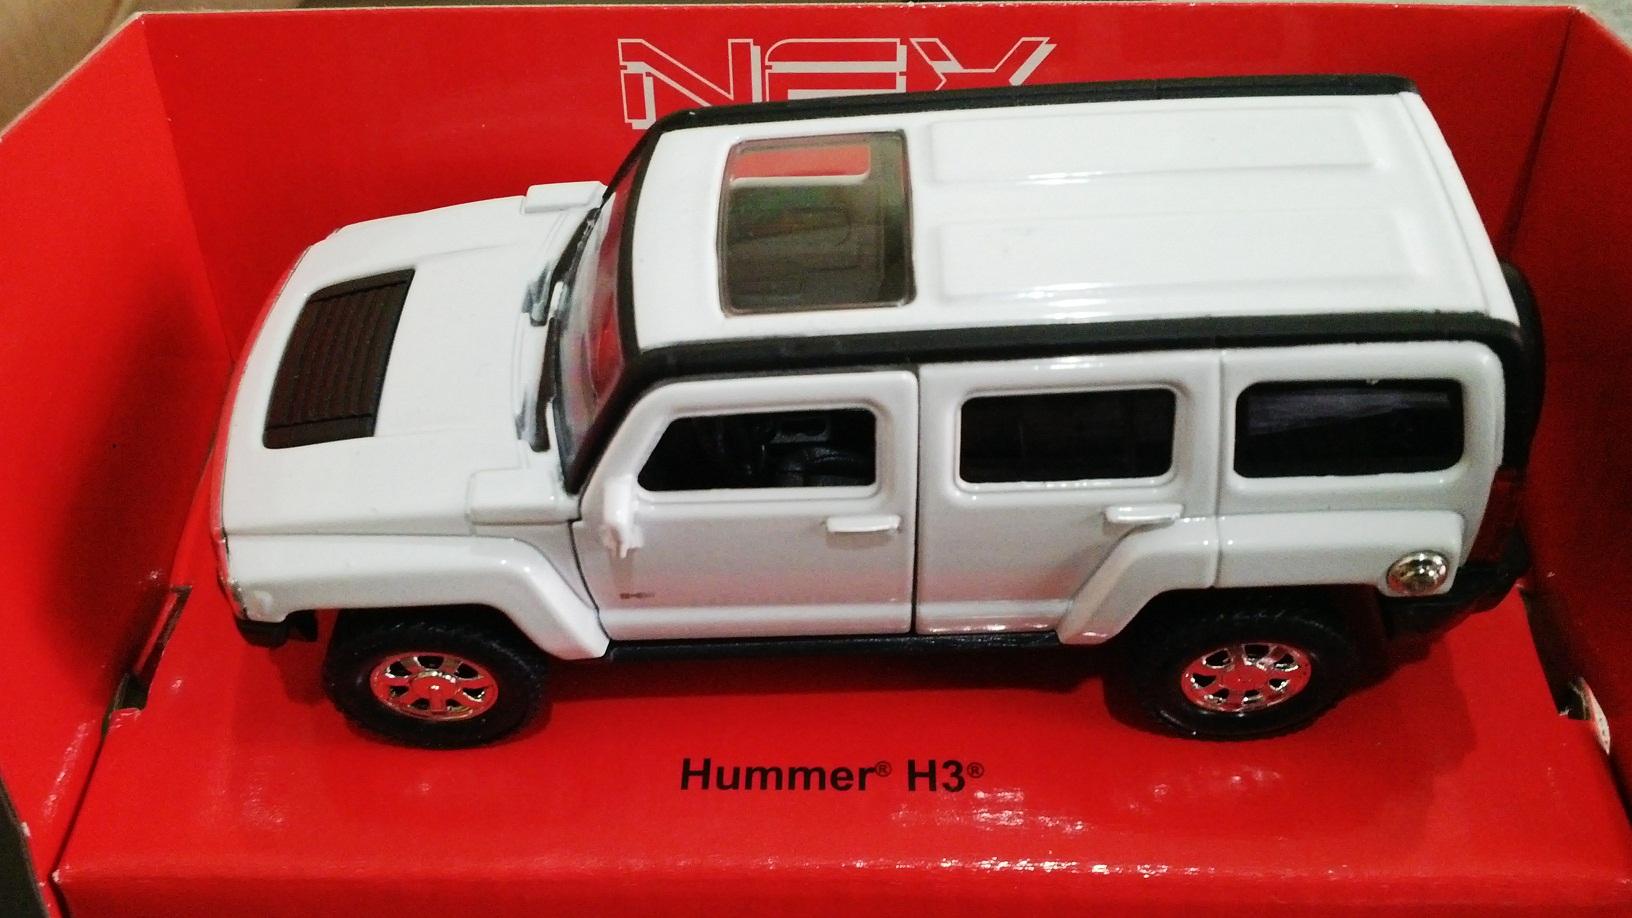 harga Welly Nex - Hummer H3 (Putih) Tokopedia.com